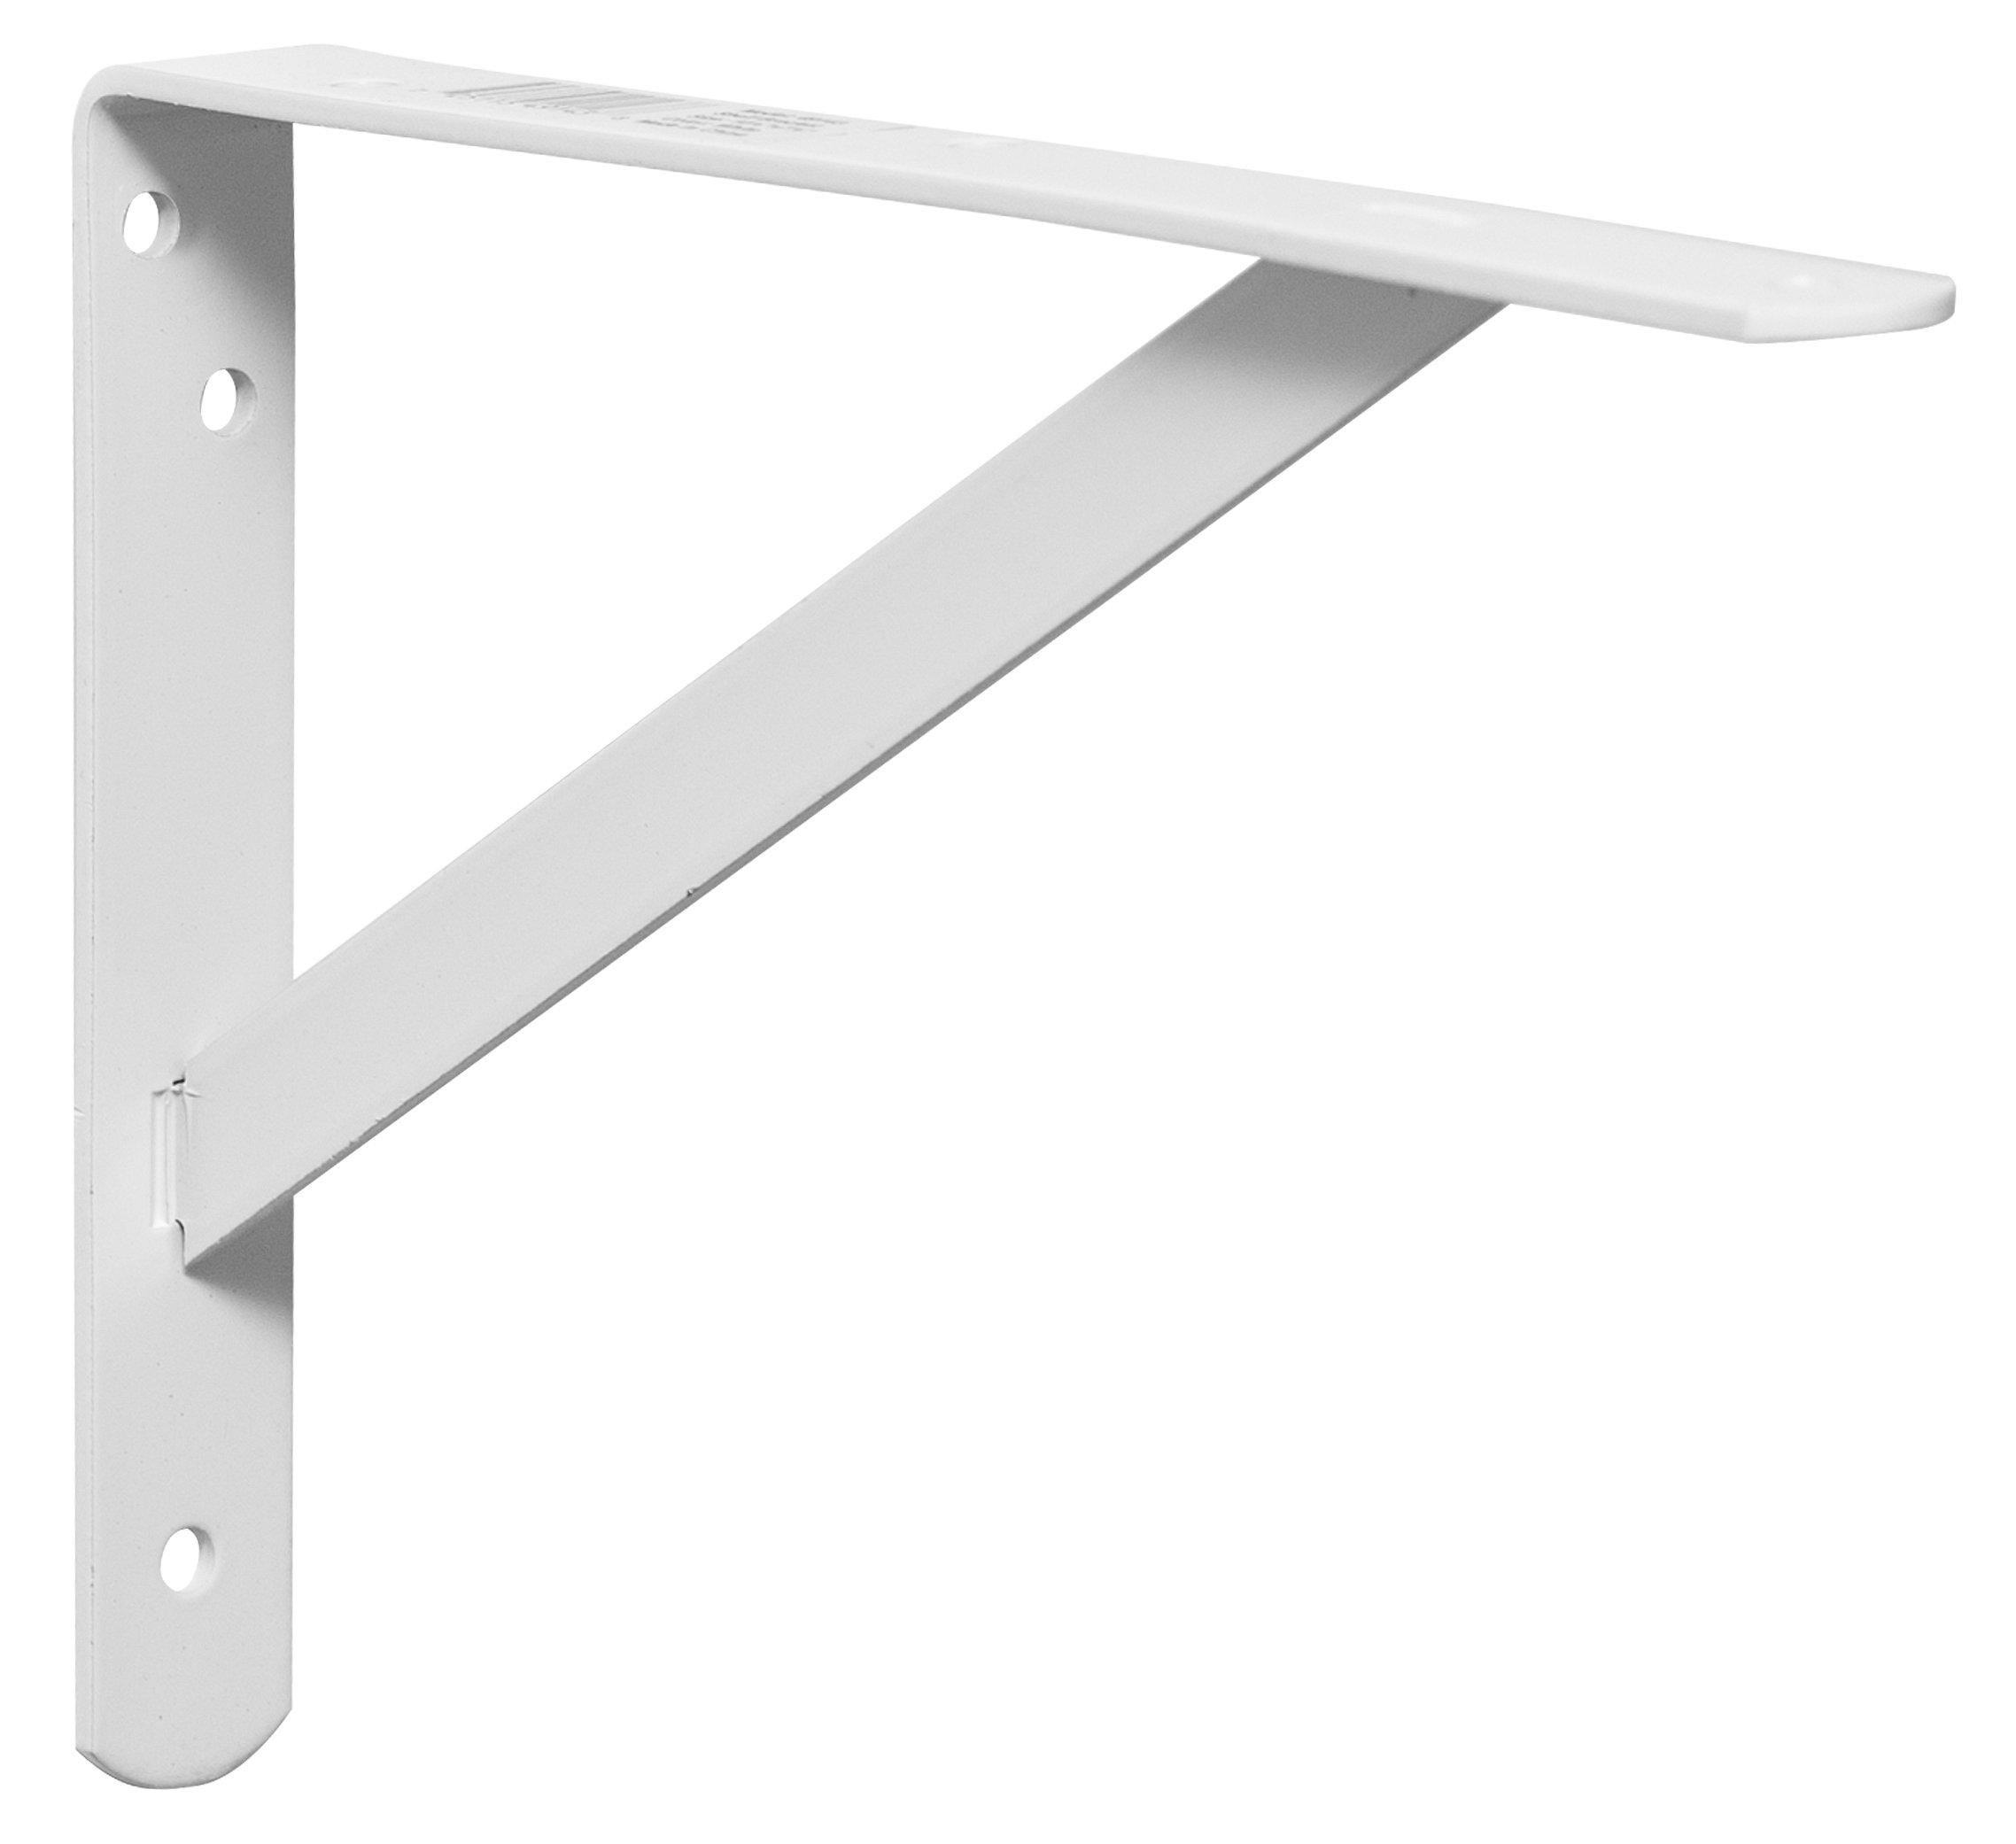 Decko 49143 Heavy Duty Shelf Bracket, 10.5-Inch by 7.5-Inch, White, 10-Pack